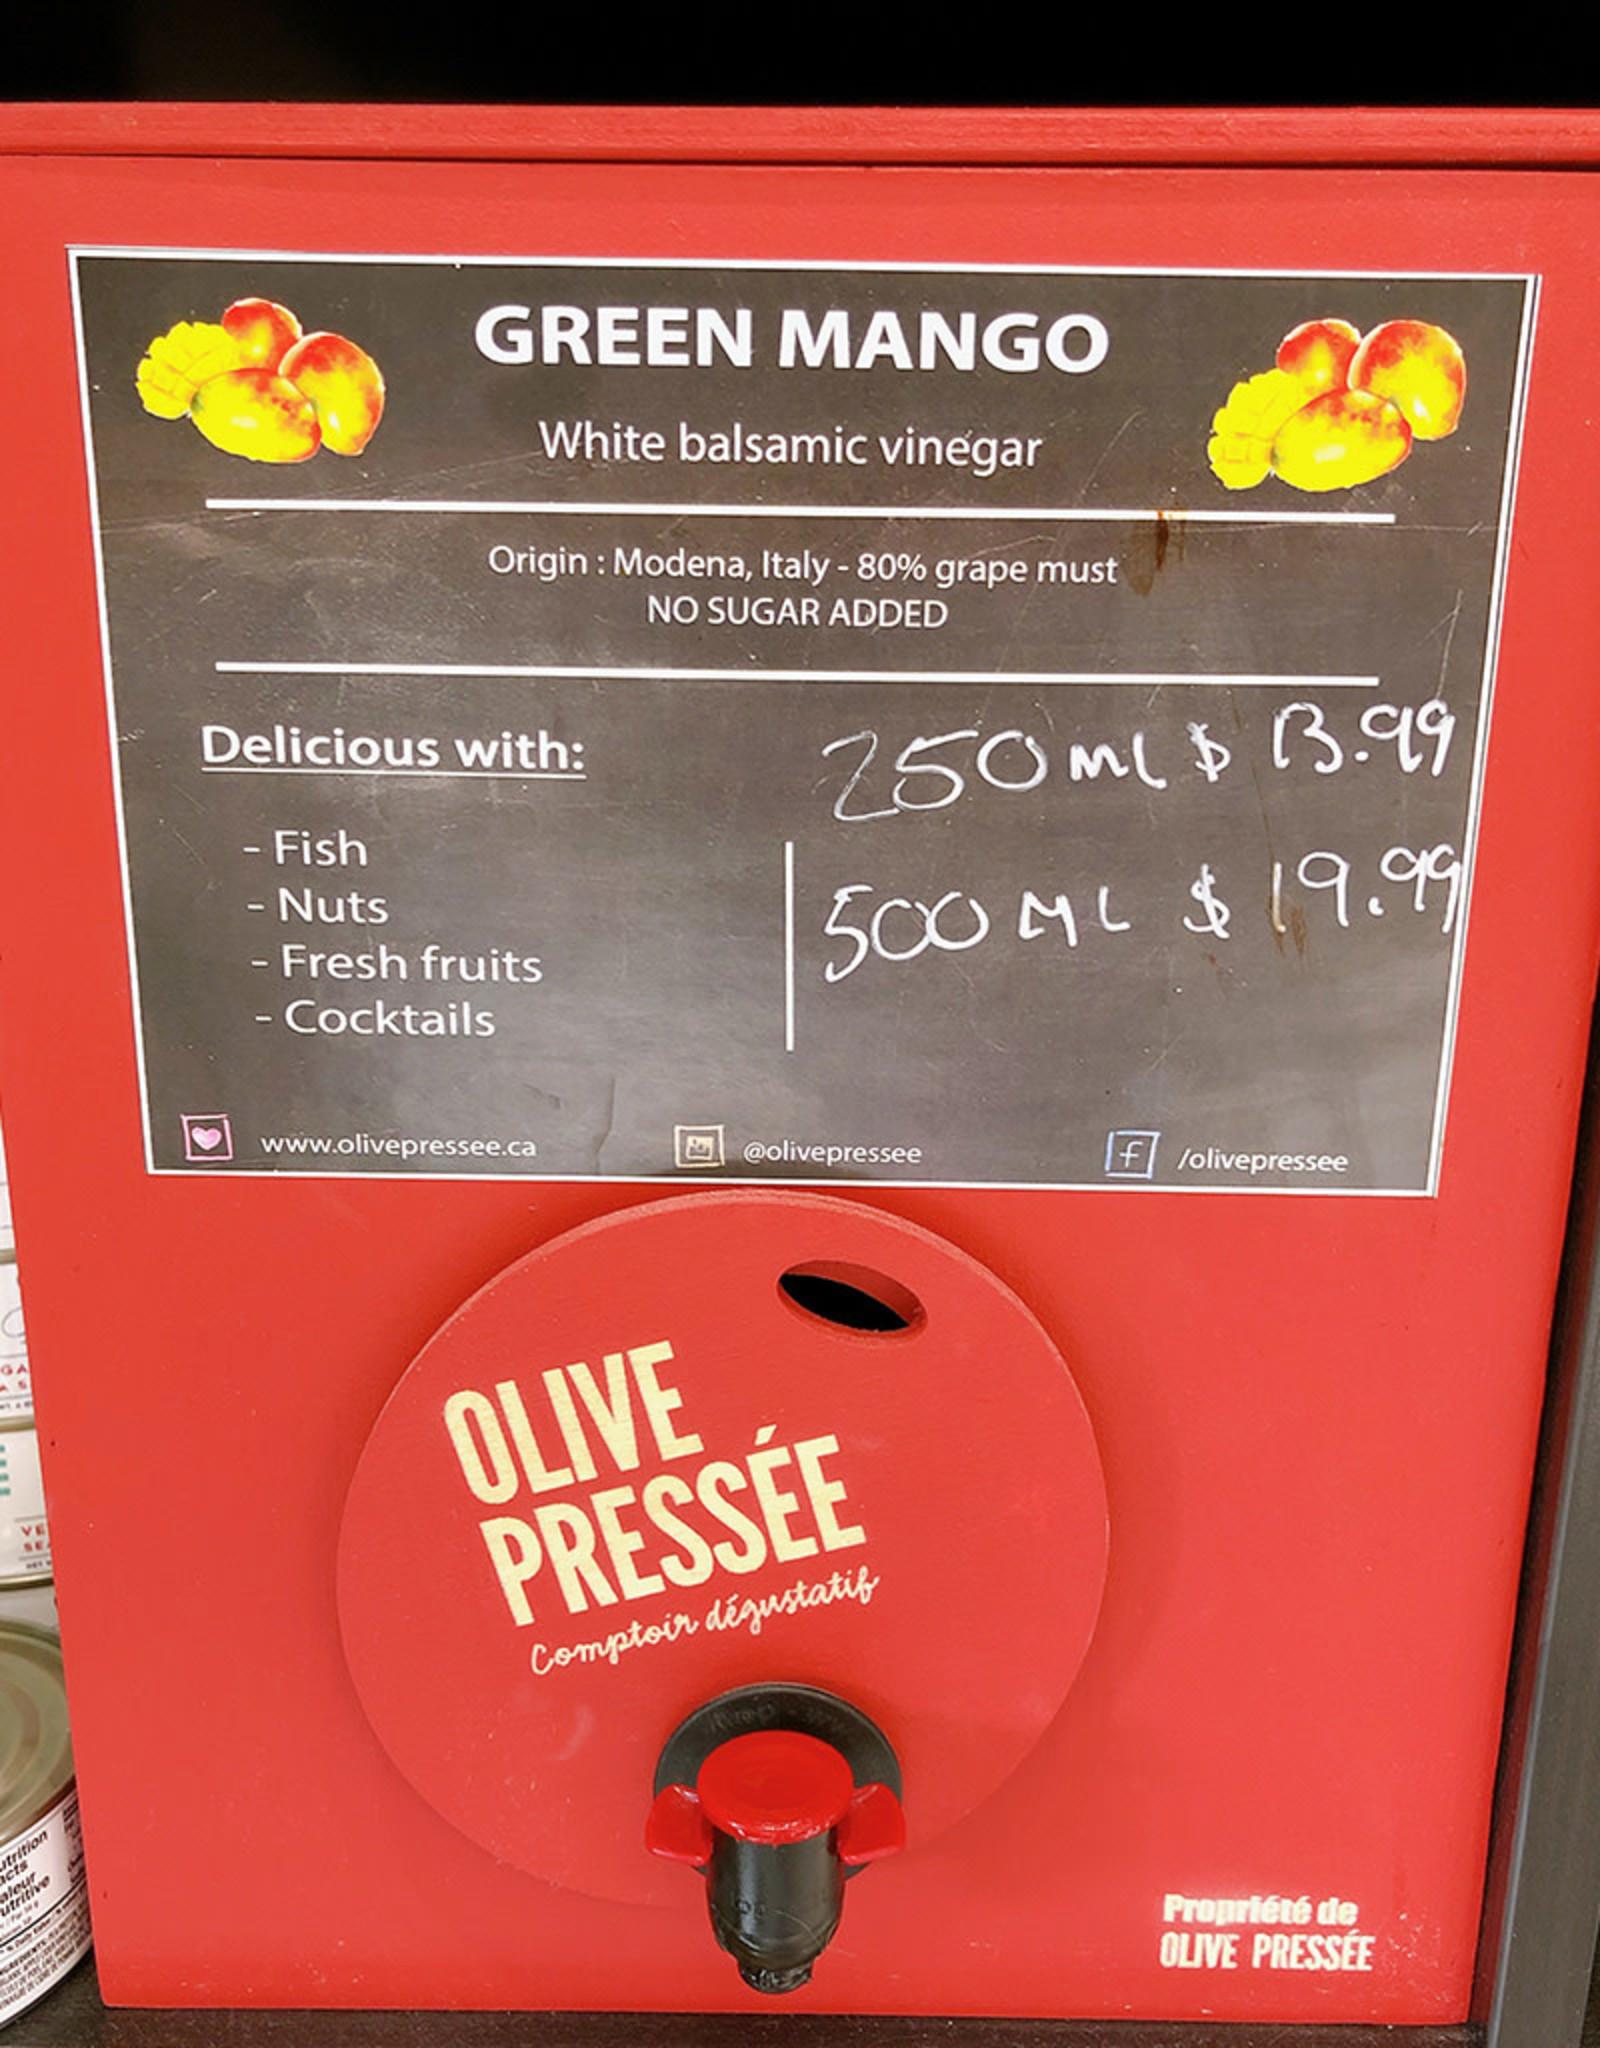 Olive Pressee Olive Pressee - Green Mango, 500ml